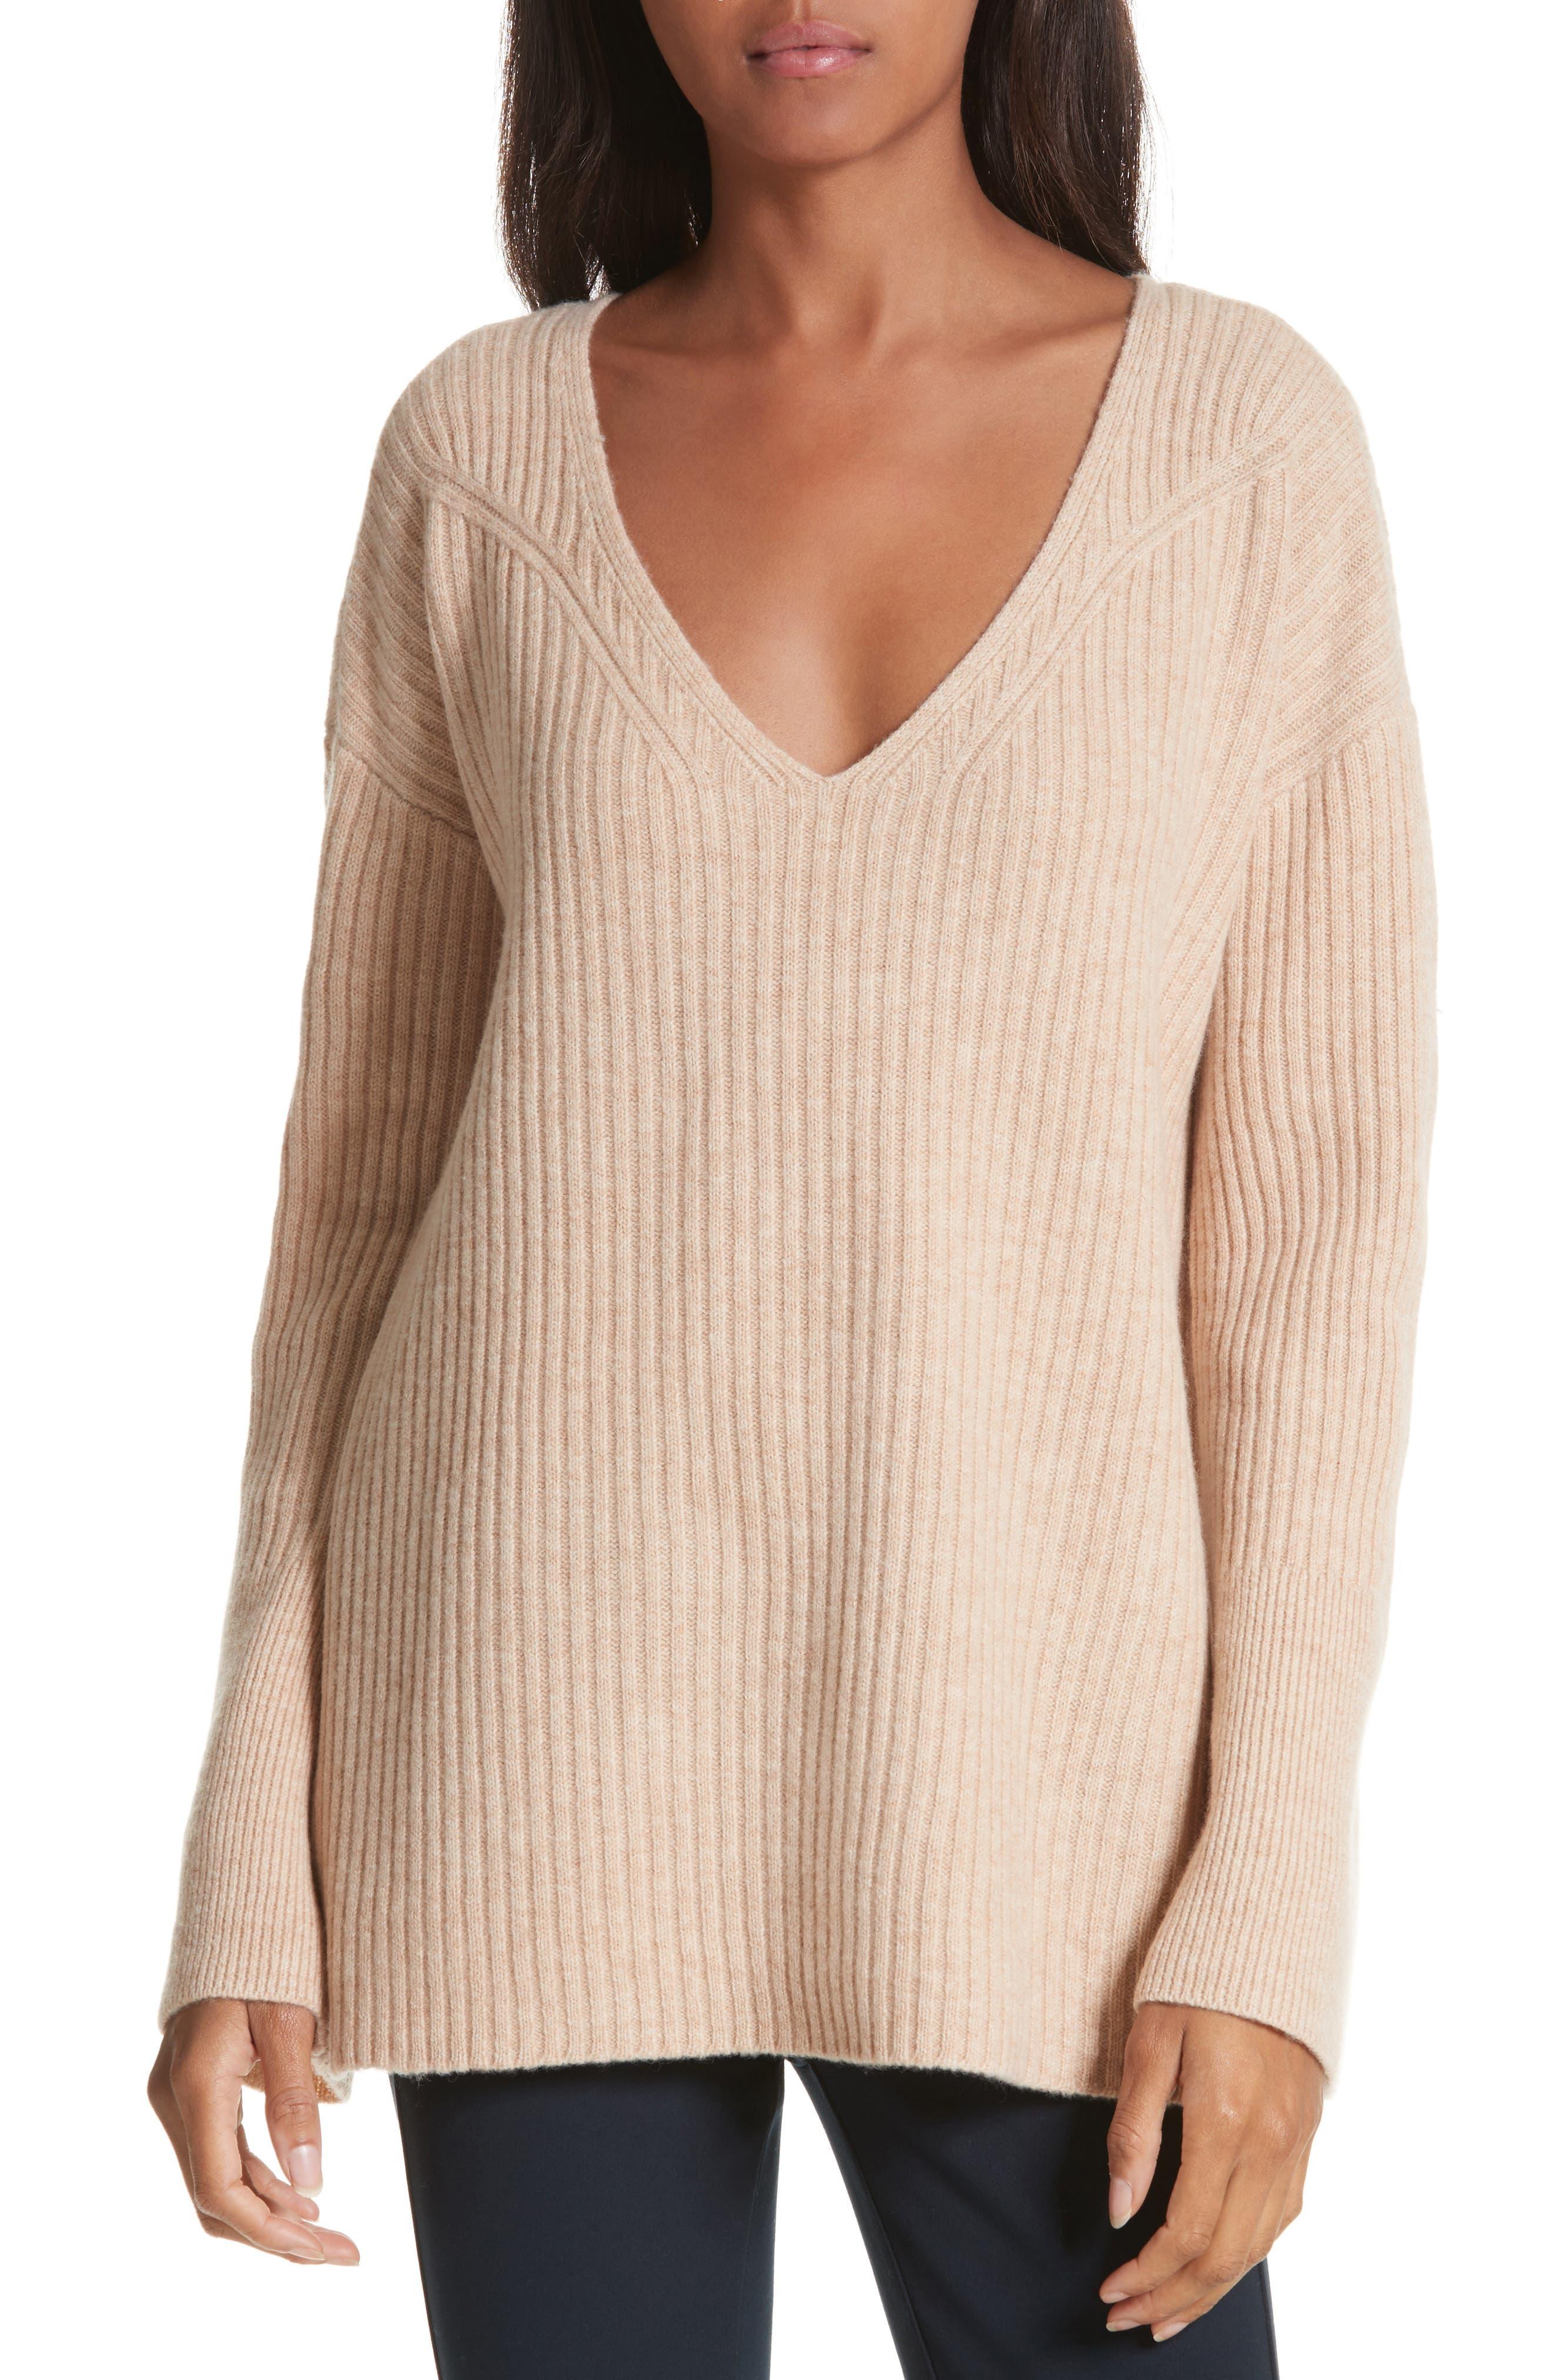 Mitchell Merino Wool Sweater,                             Main thumbnail 1, color,                             Oat